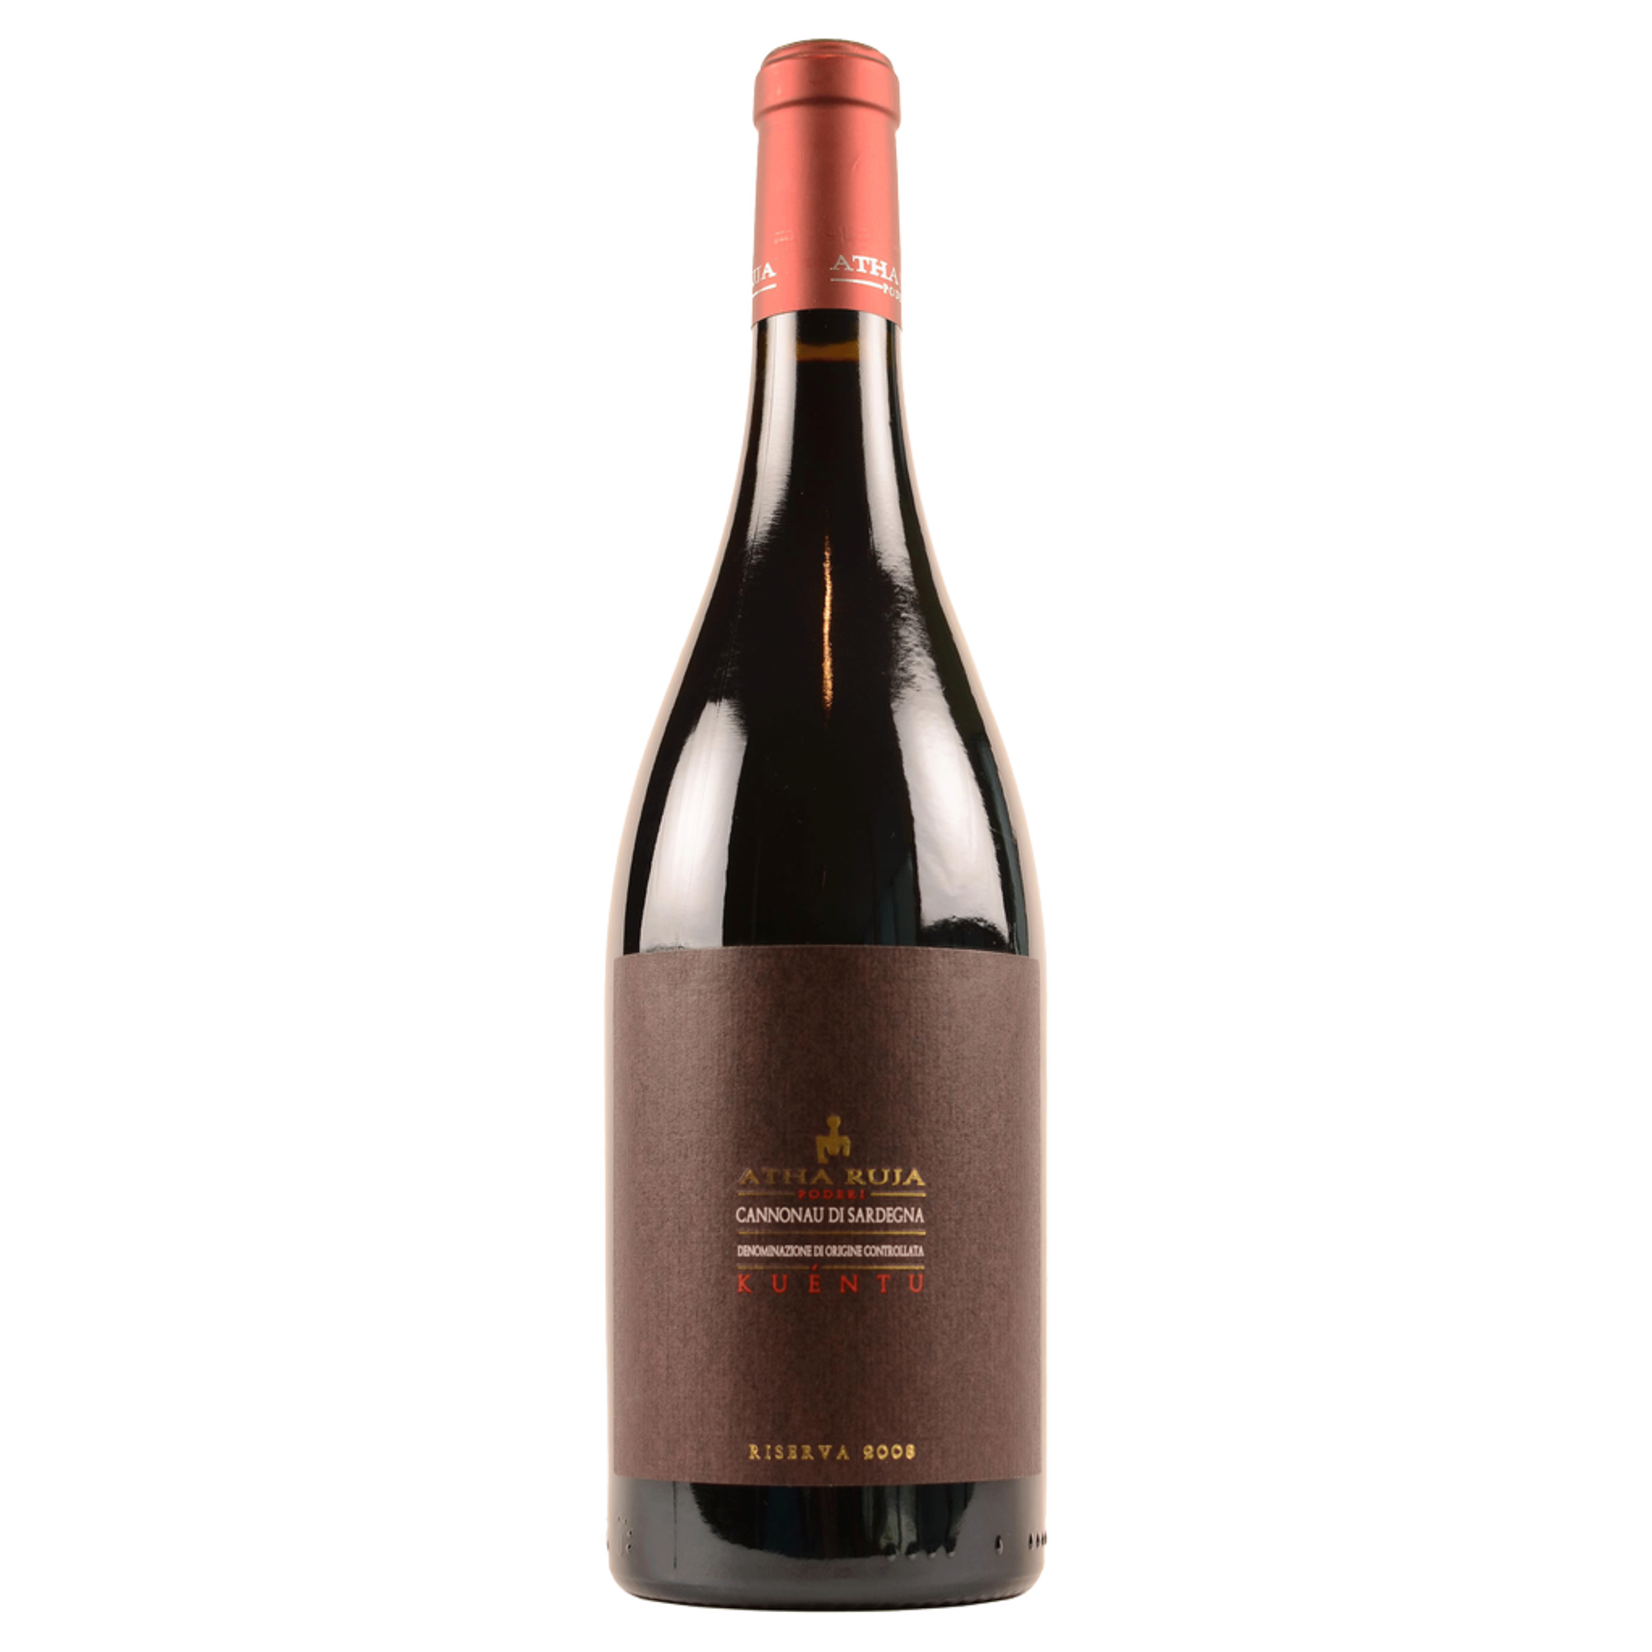 Wine Atha Ruja Kuentu Cannonau di Sardegna Riserva